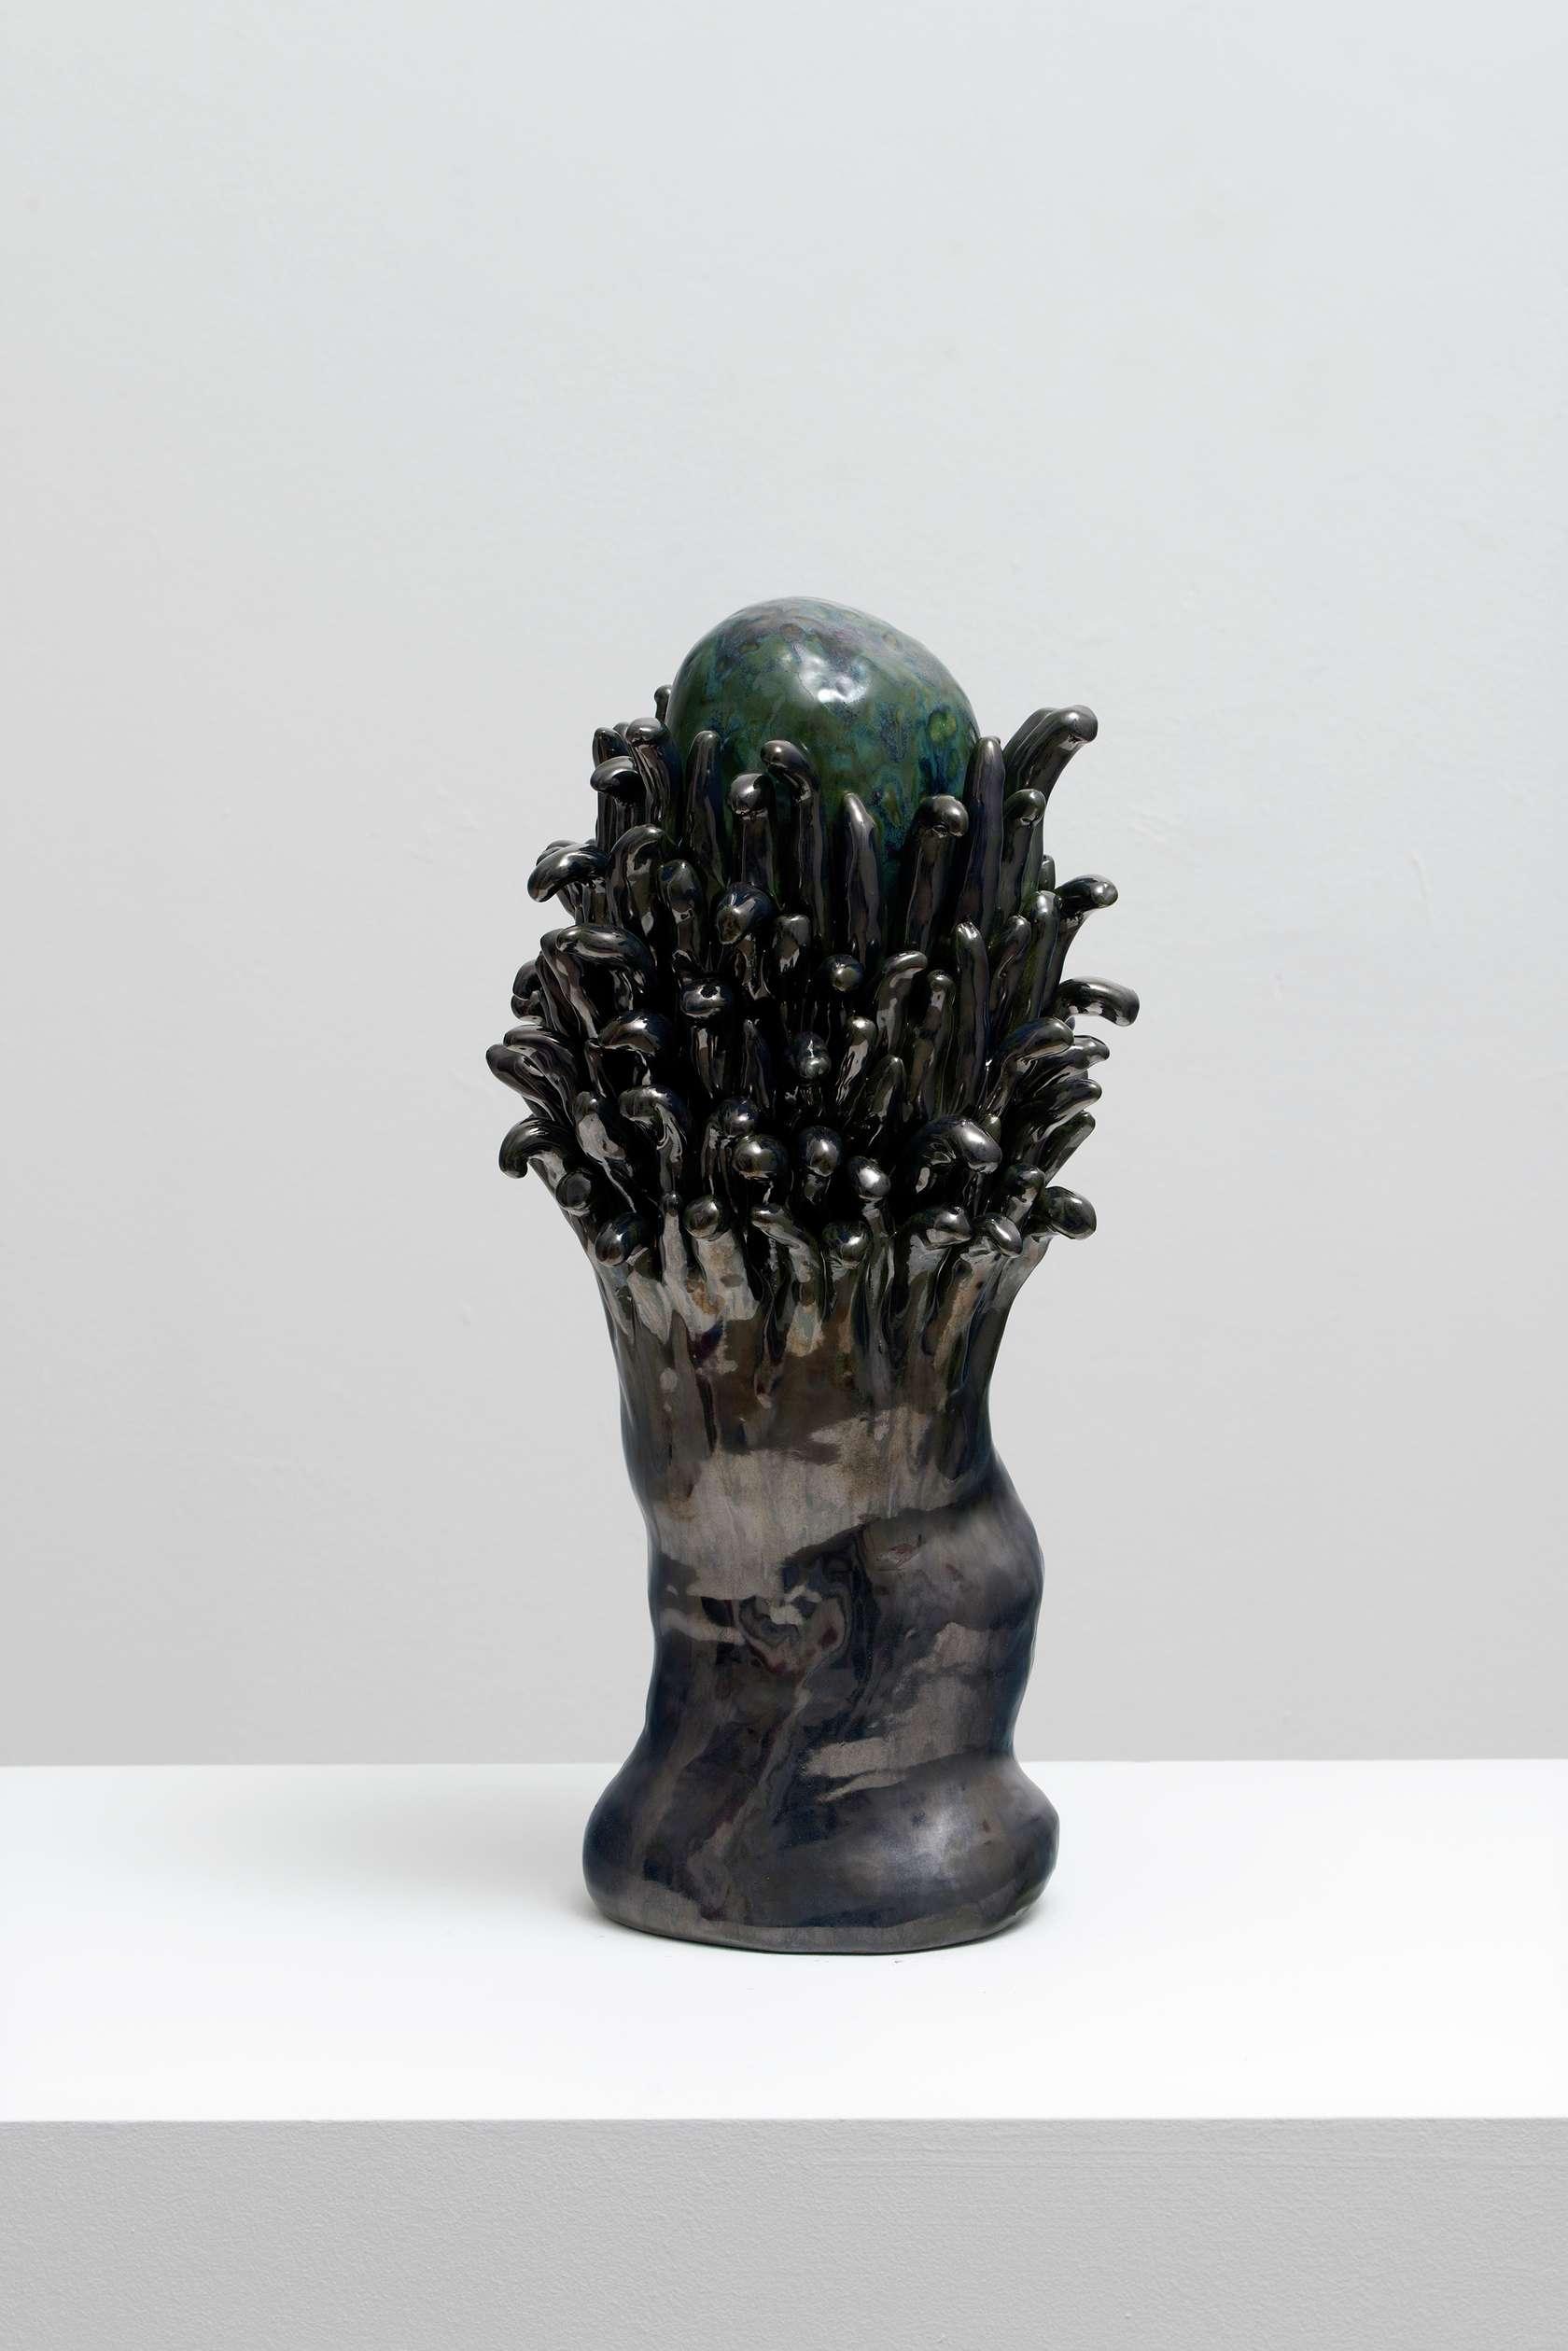 Salvatore Arancio, BF 17, 2019 Céramique émaillée44 x 21 x 19 cm / 17 3/8 x 8 2/8 x 7 1/2 inches